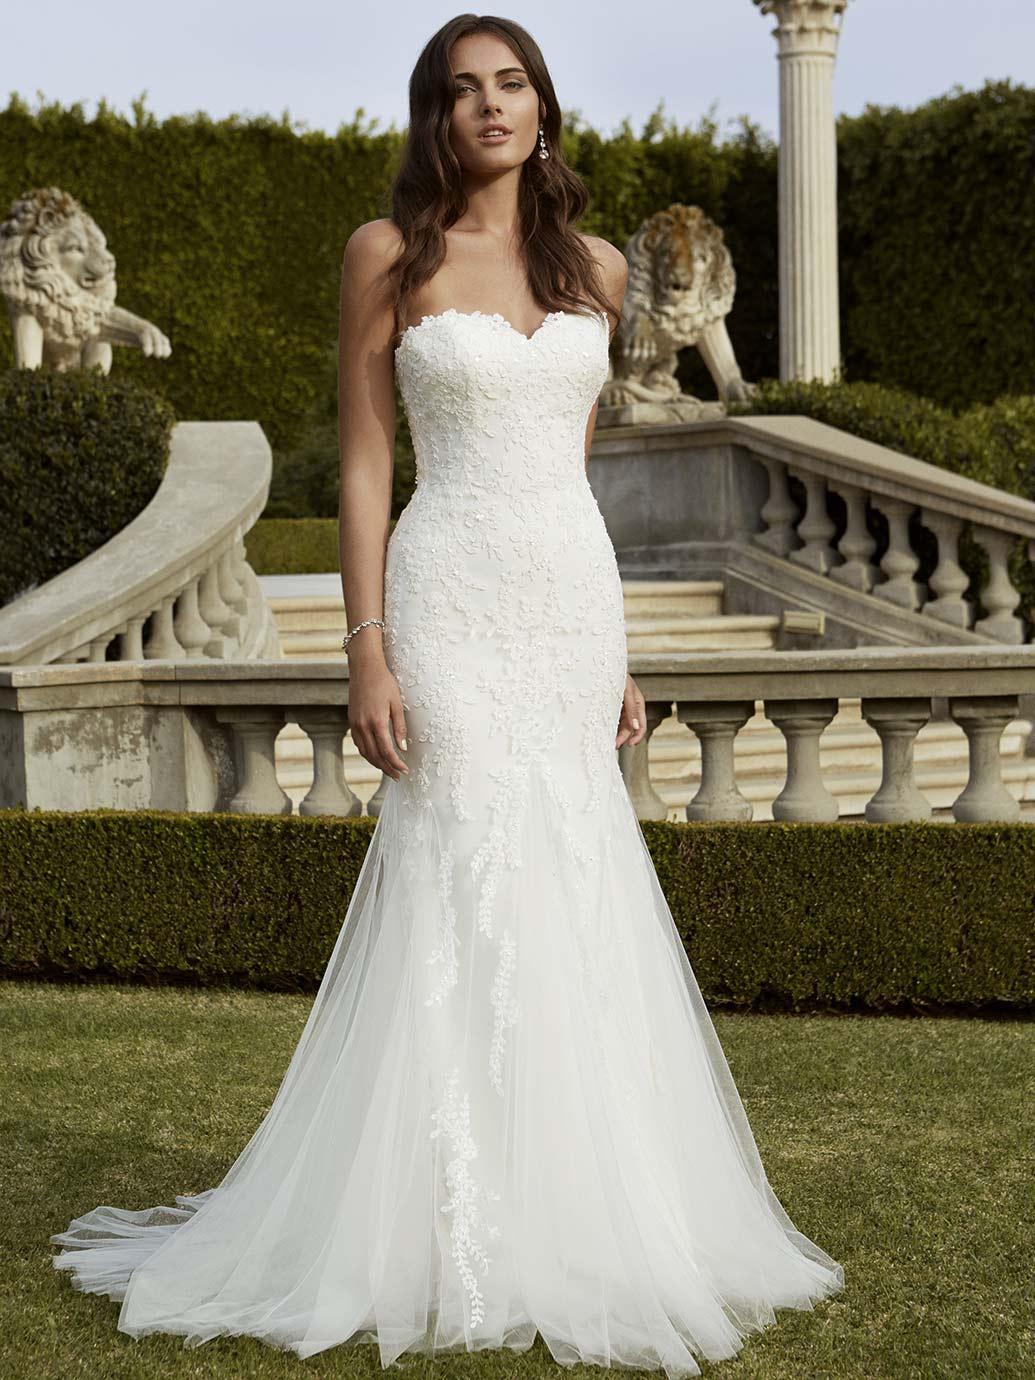 2016 Simple Mermaid Wedding Dresses Cheap Sexy Strapless Hem Lace ...